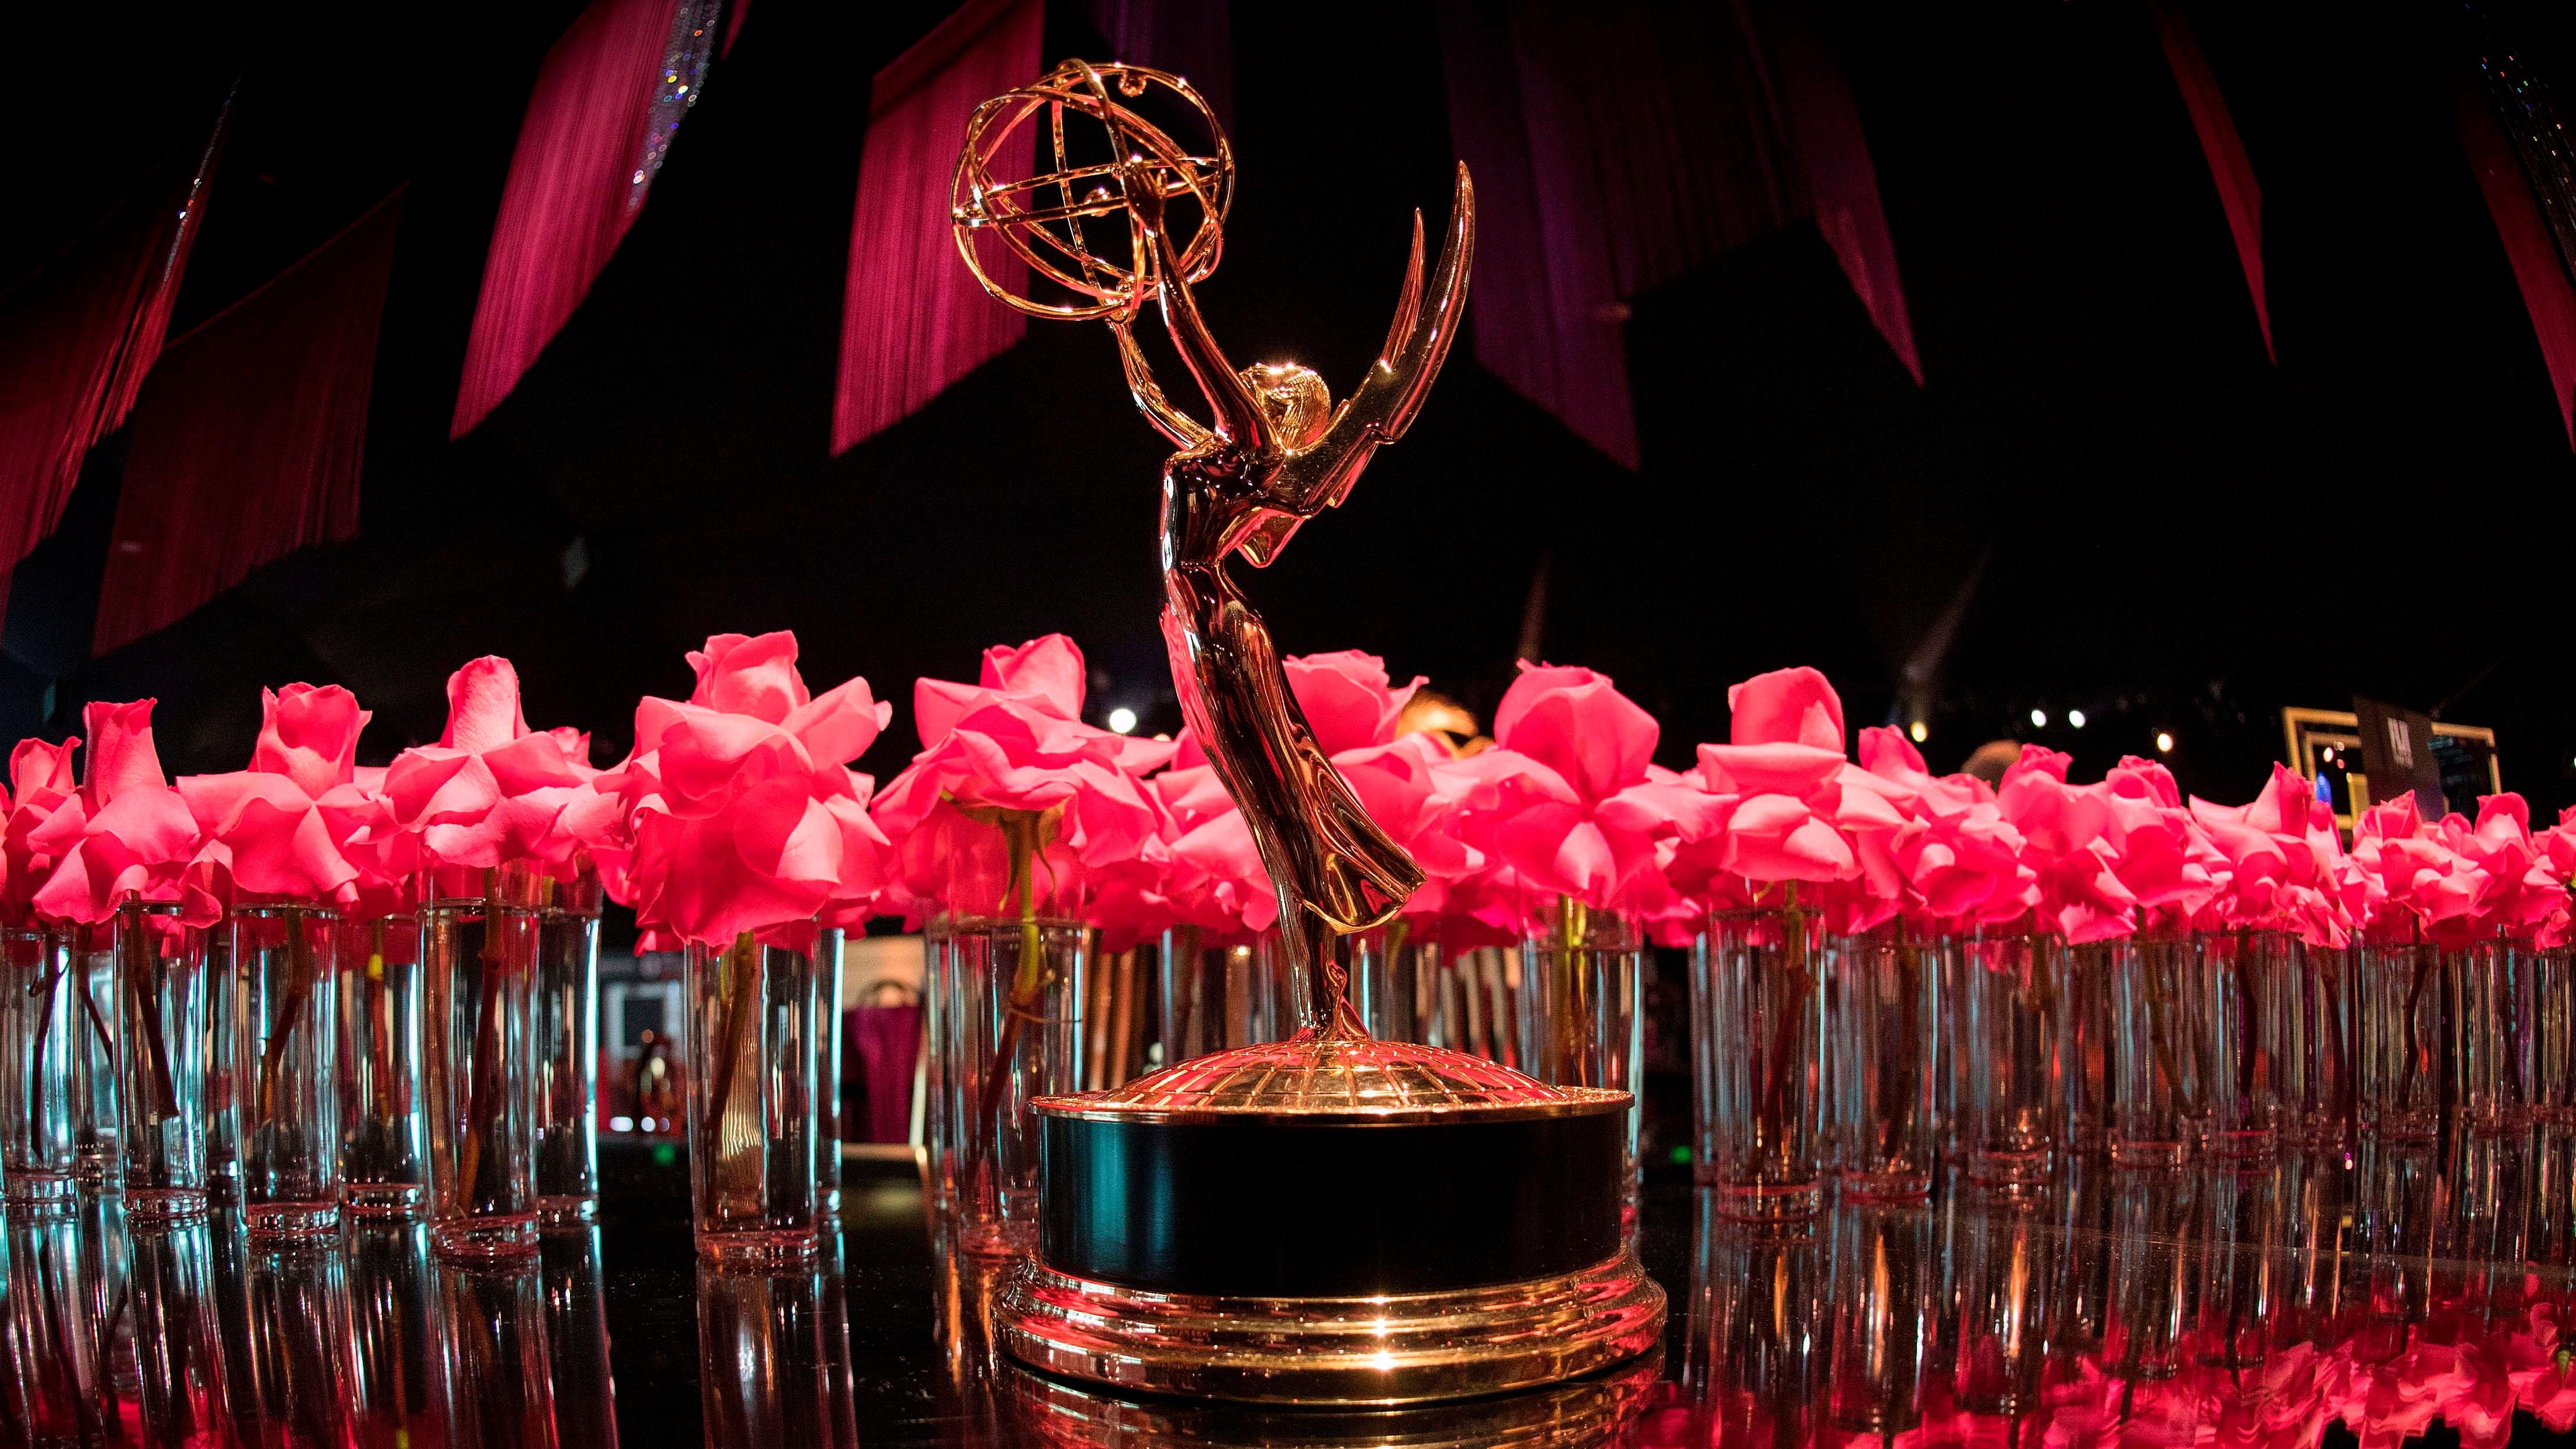 Emmy Award Statues